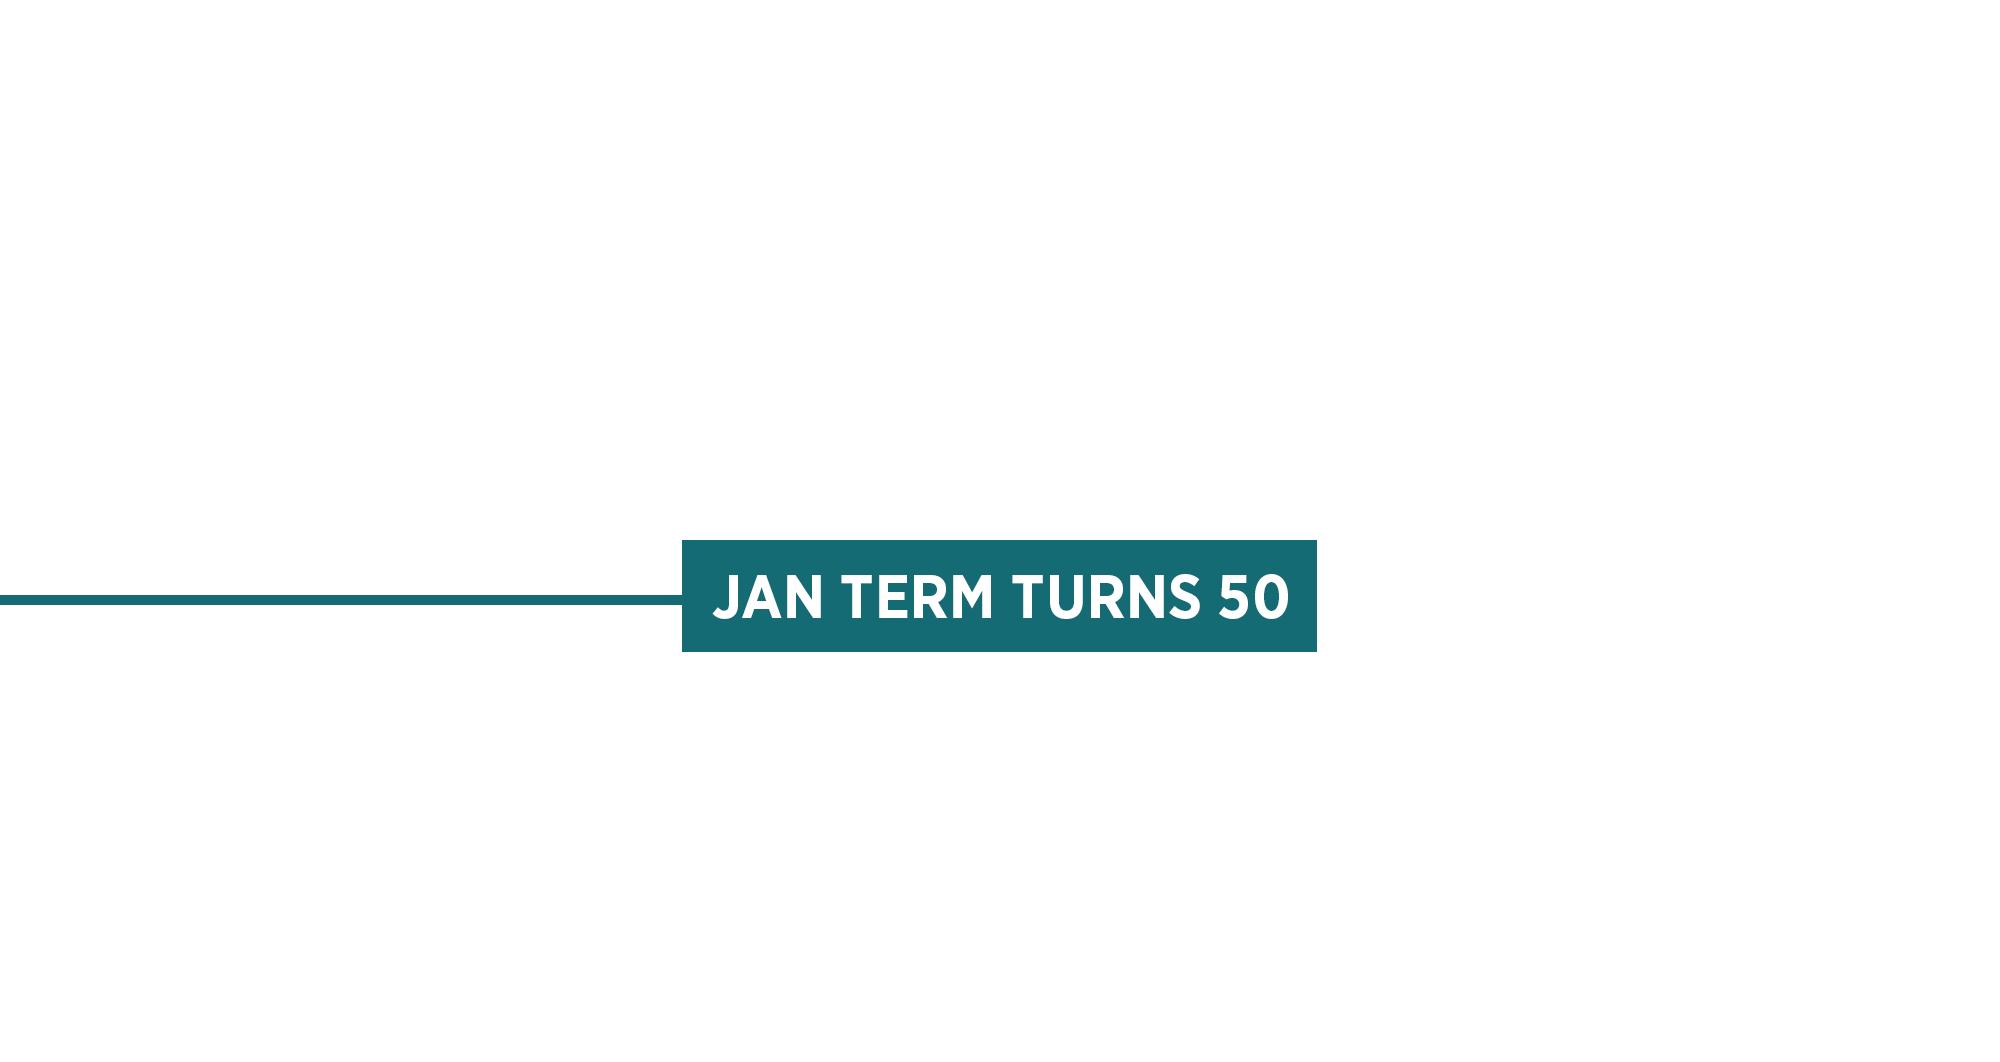 Jan Term | Our Stories | Whitworth University